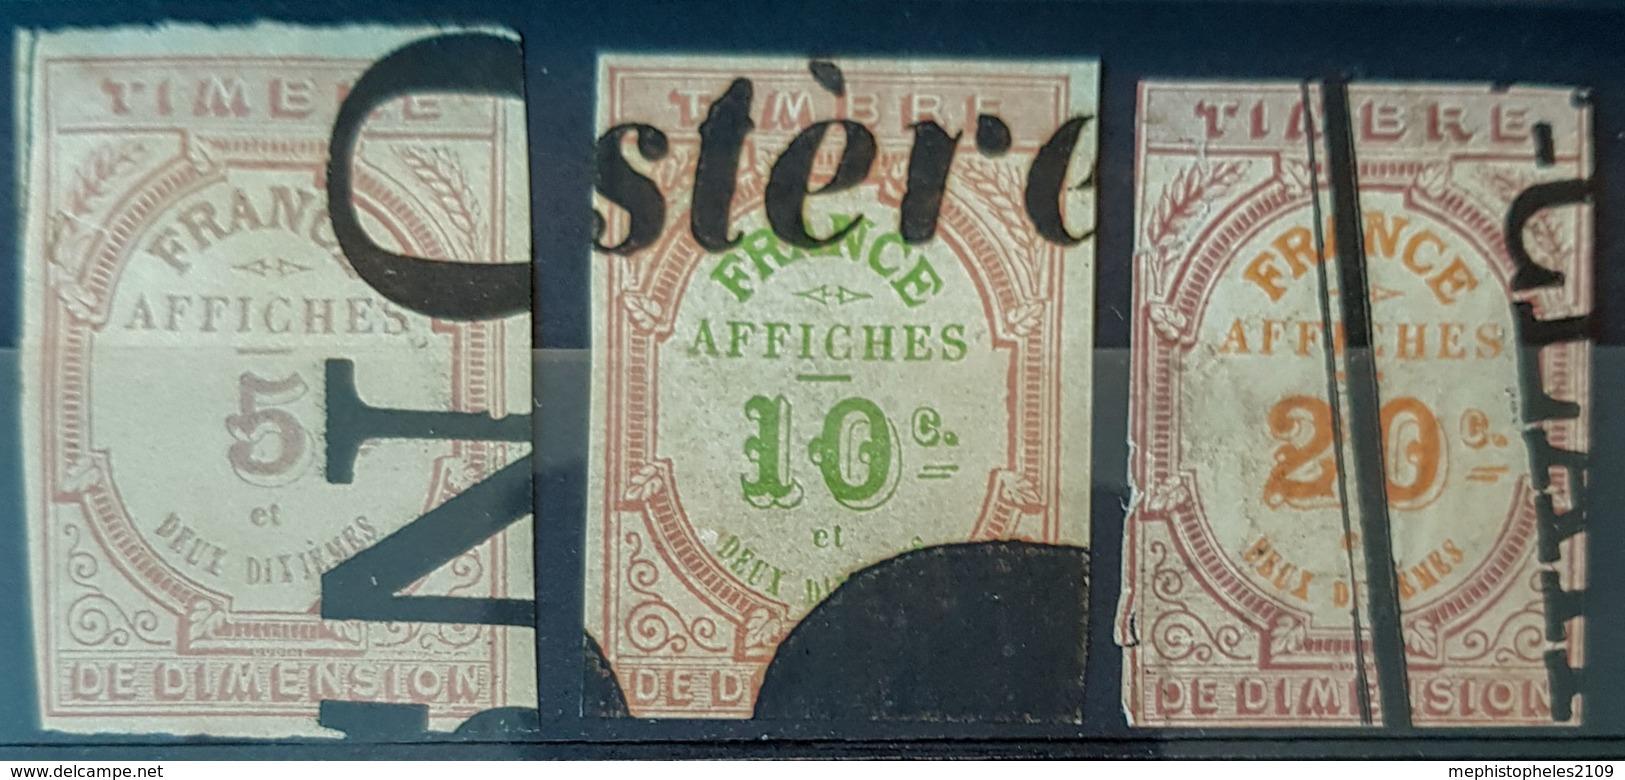 FRANCE 1872 - Canceled - Timbres Affiche - YT 1, 2, 3 - Fiscaux